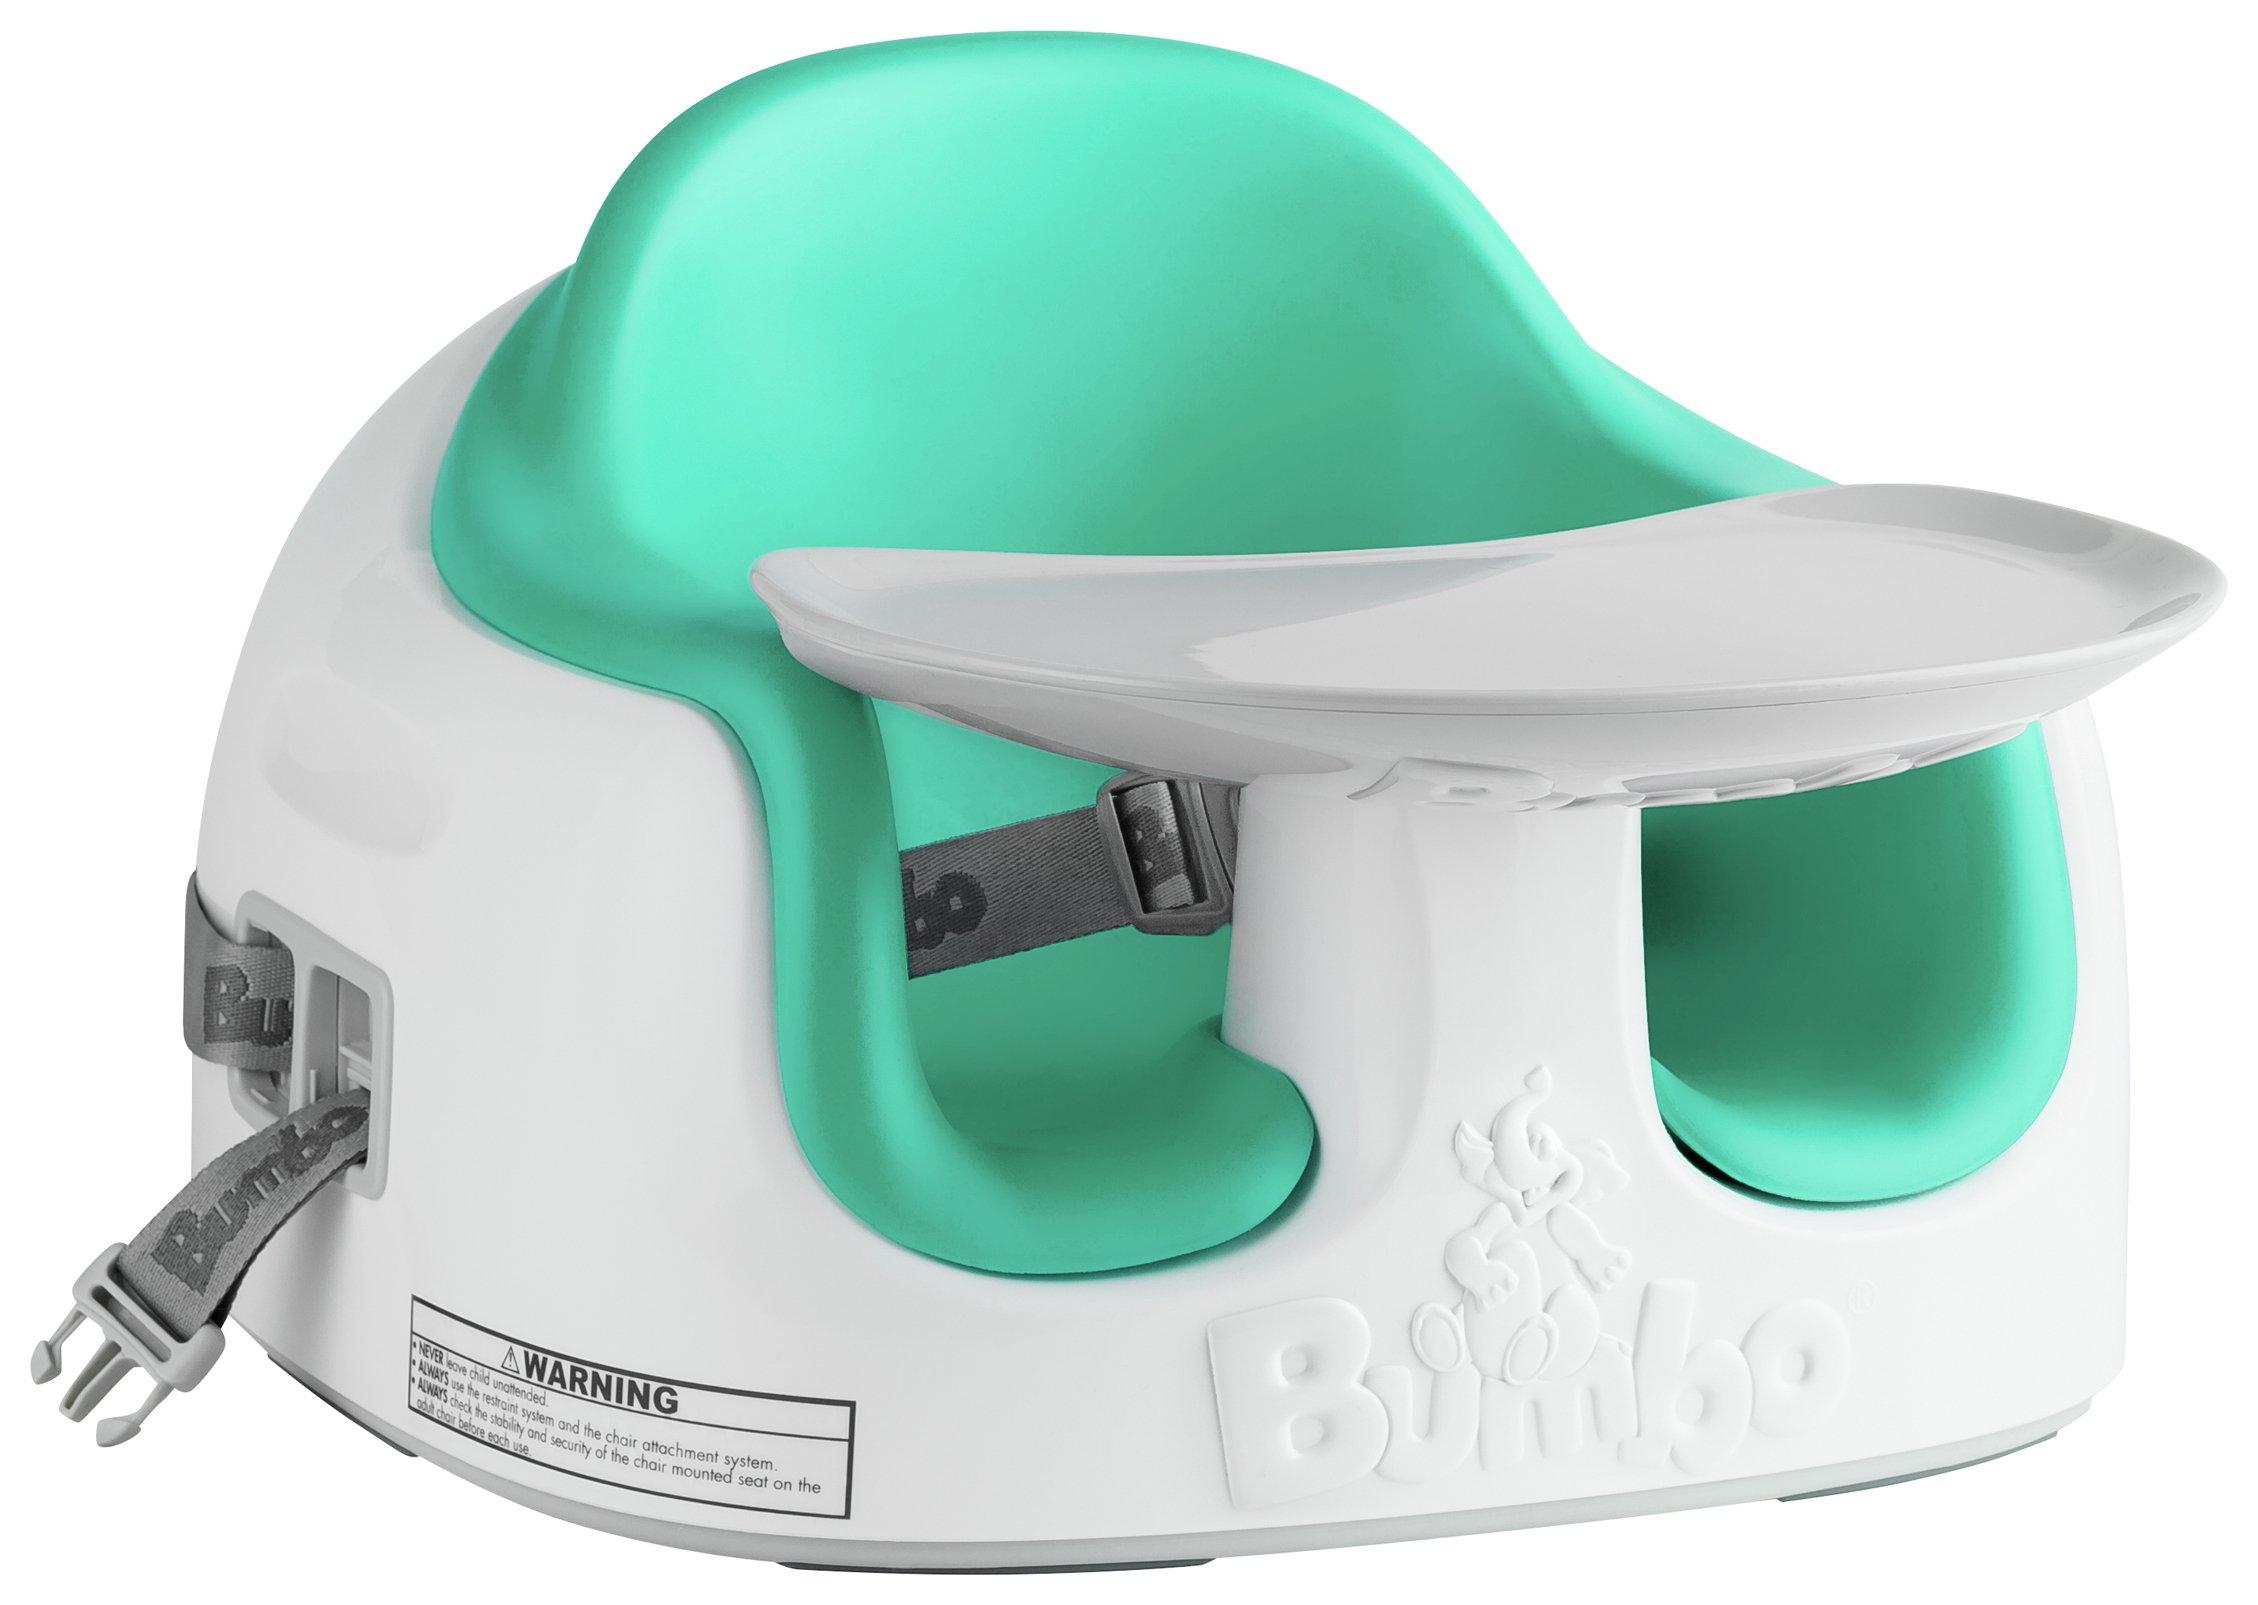 Image of Bumbo Multi Seat - Aqua.